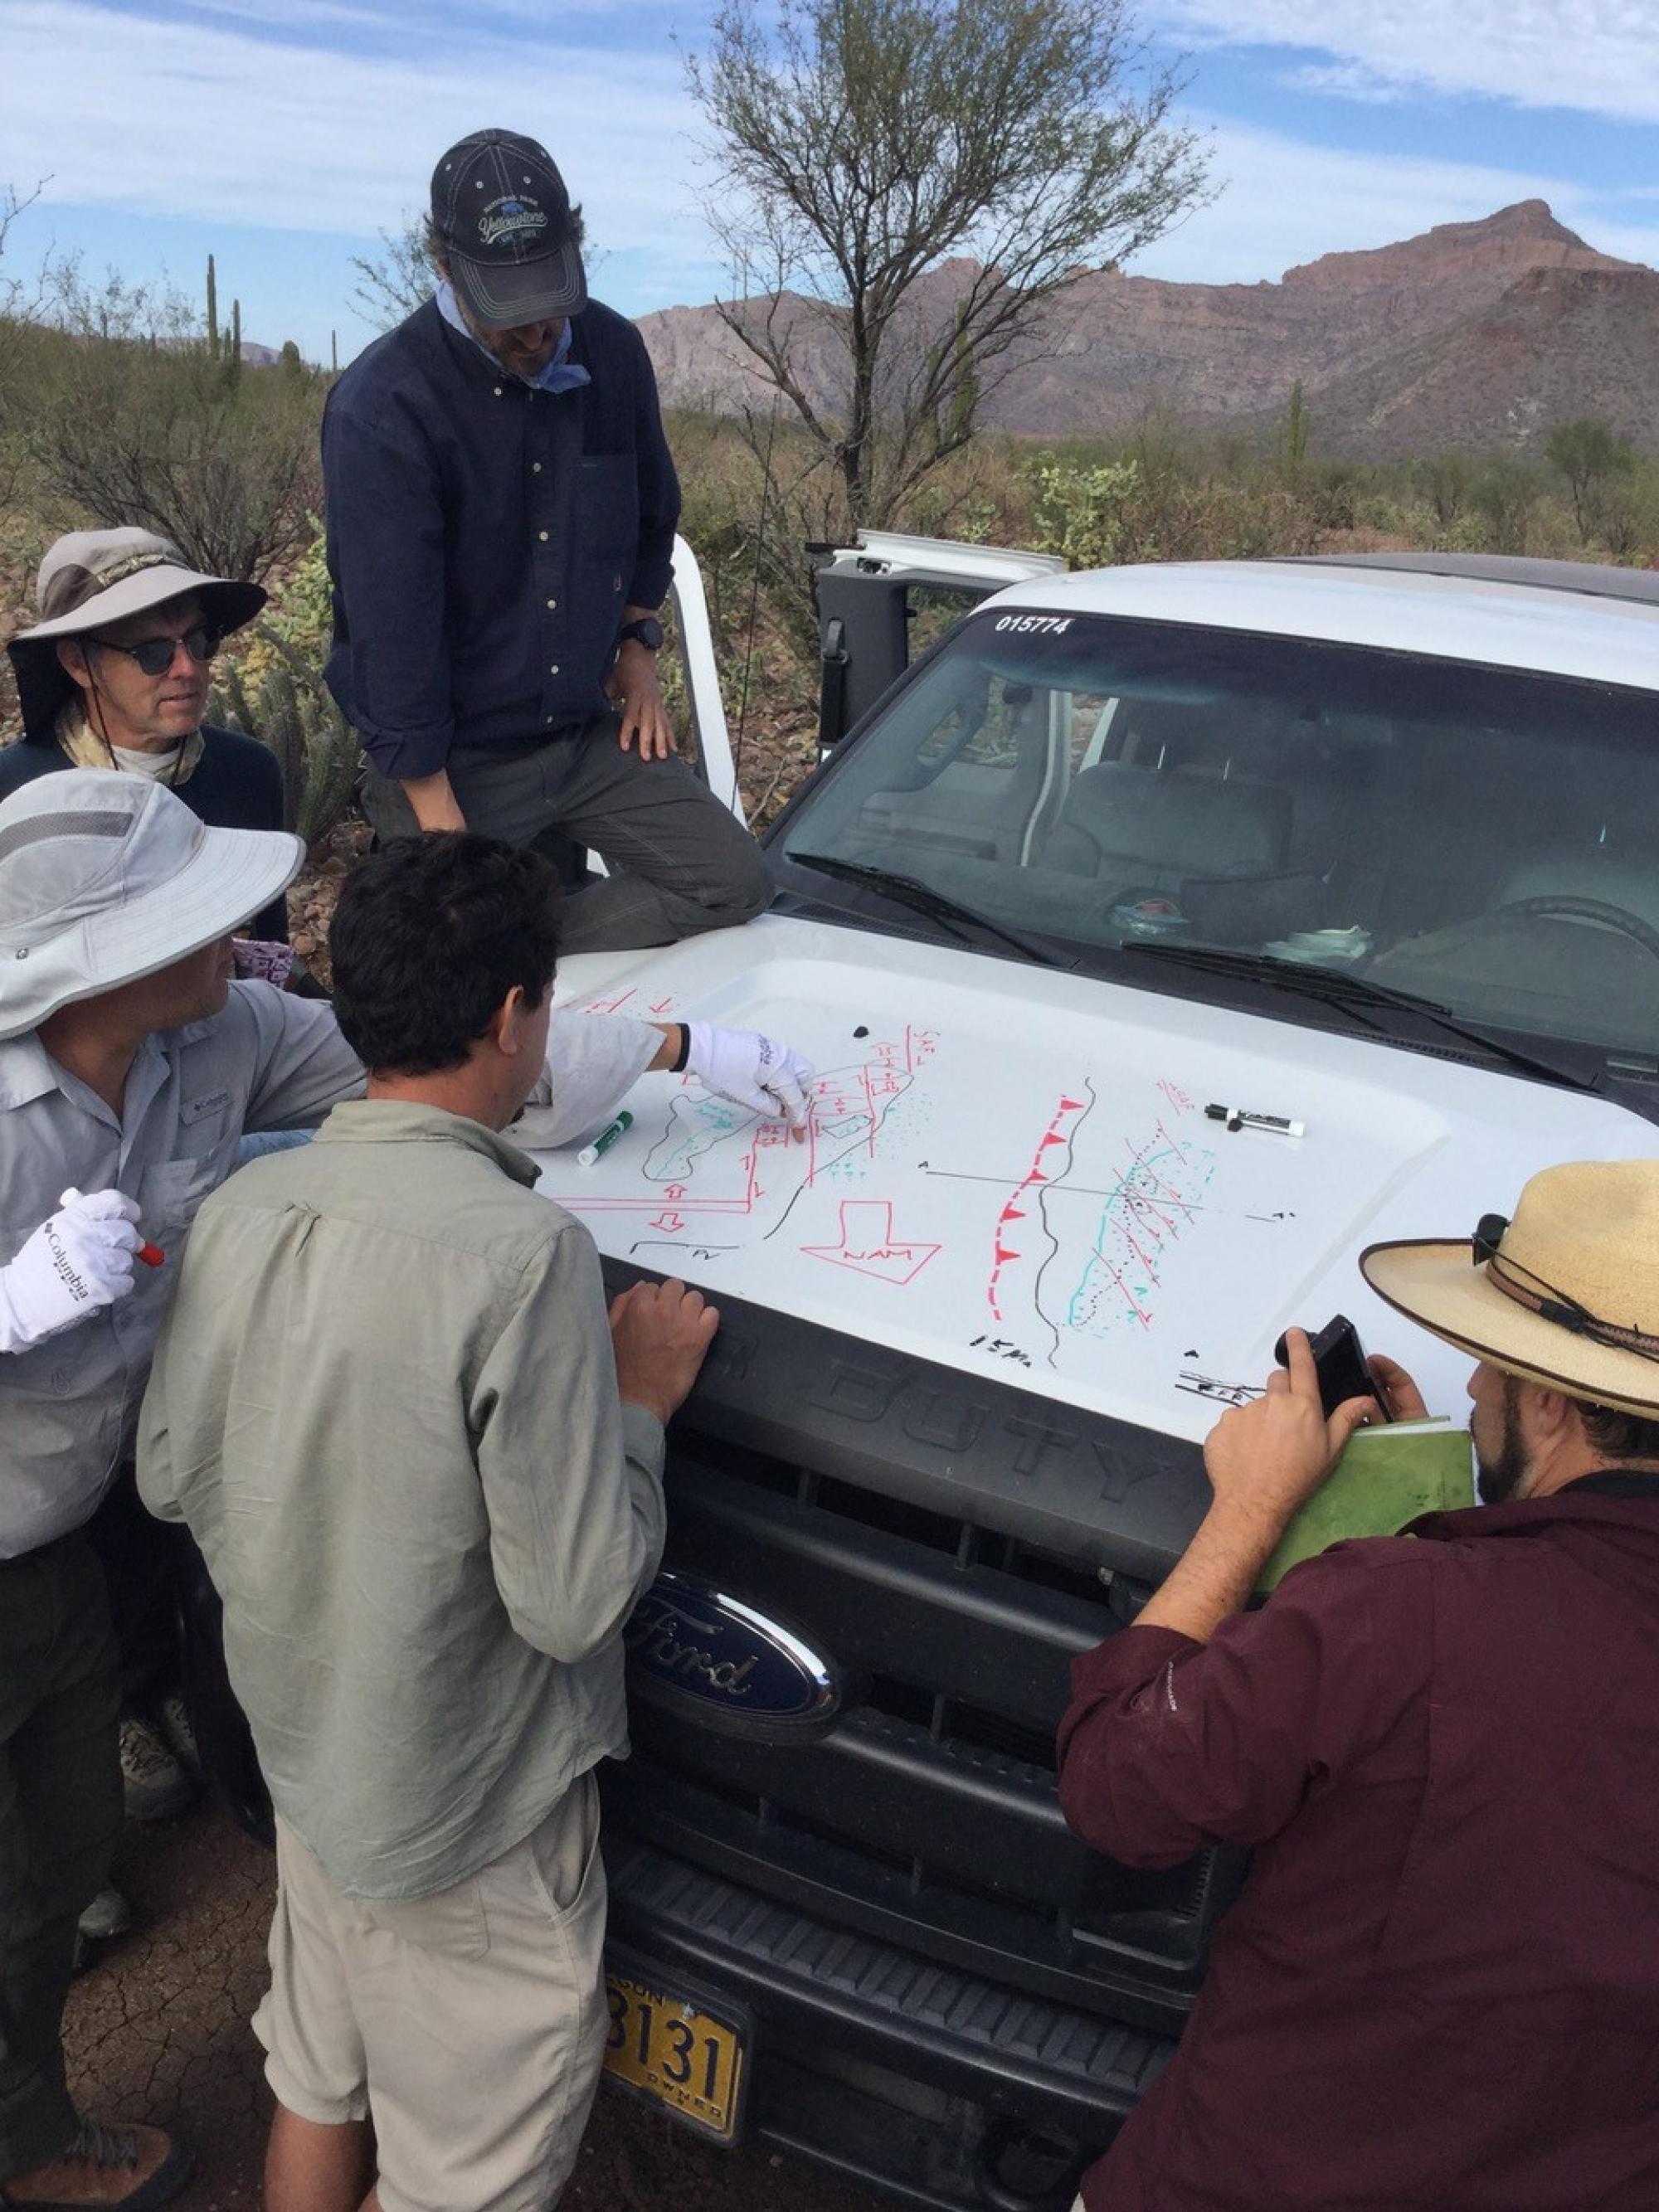 The Baja California Geogenomics team making geology doodles on the hood of their truck in the field near San Ignacio, Baja California Sur.